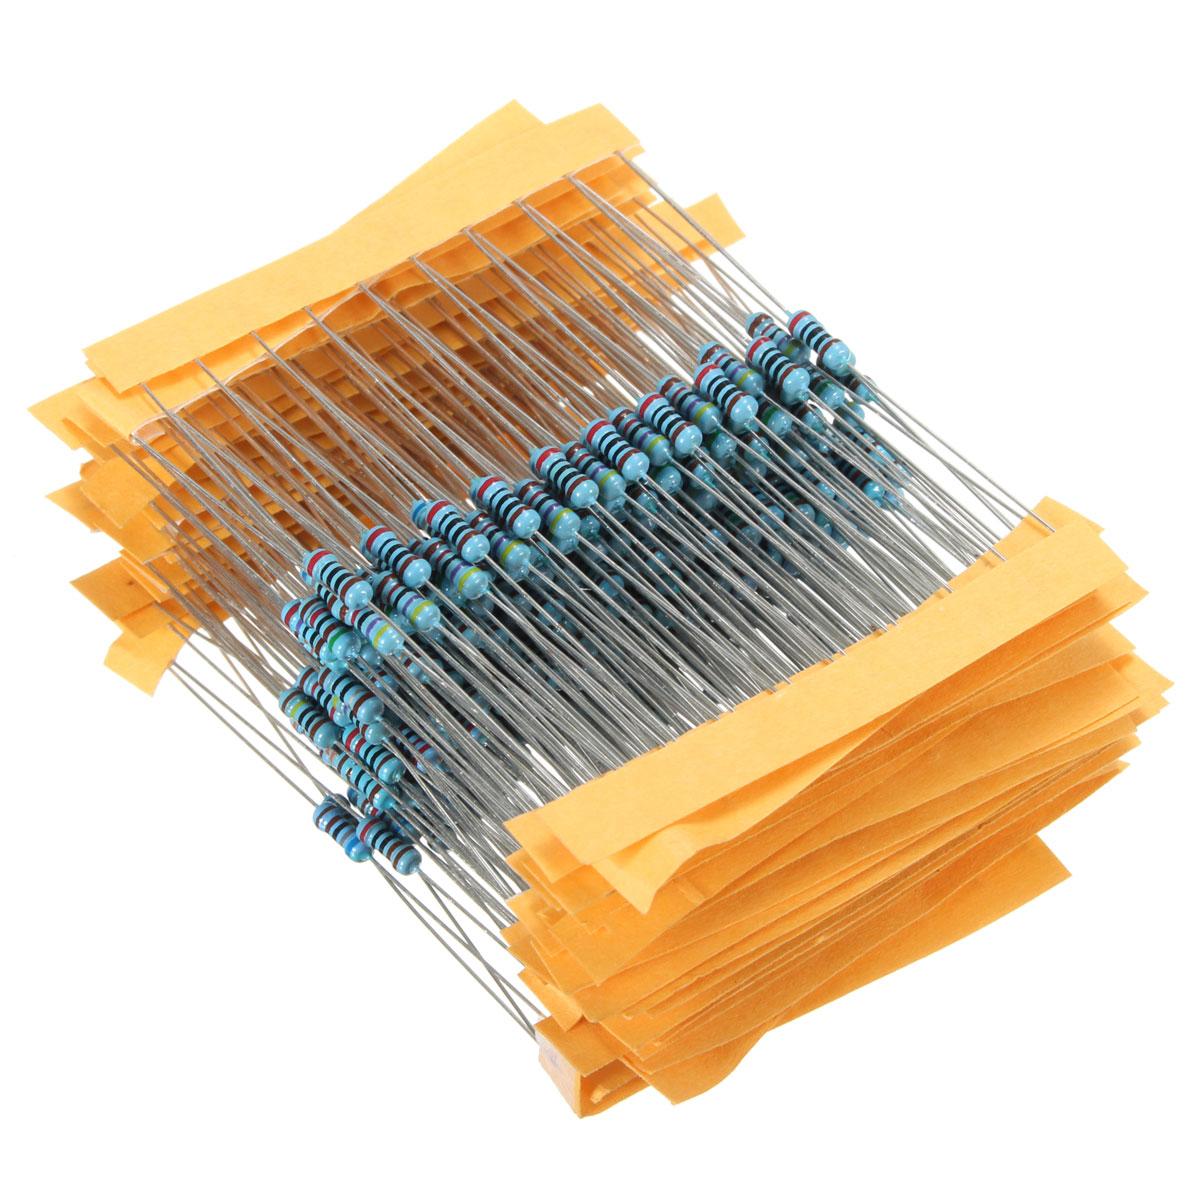 New 300Pcs DIY Led Excellent Professiona Resistors Metal Film 300 Pack 10 Each 30 Values 1/4w 1% Kit/Assortment Chip Set